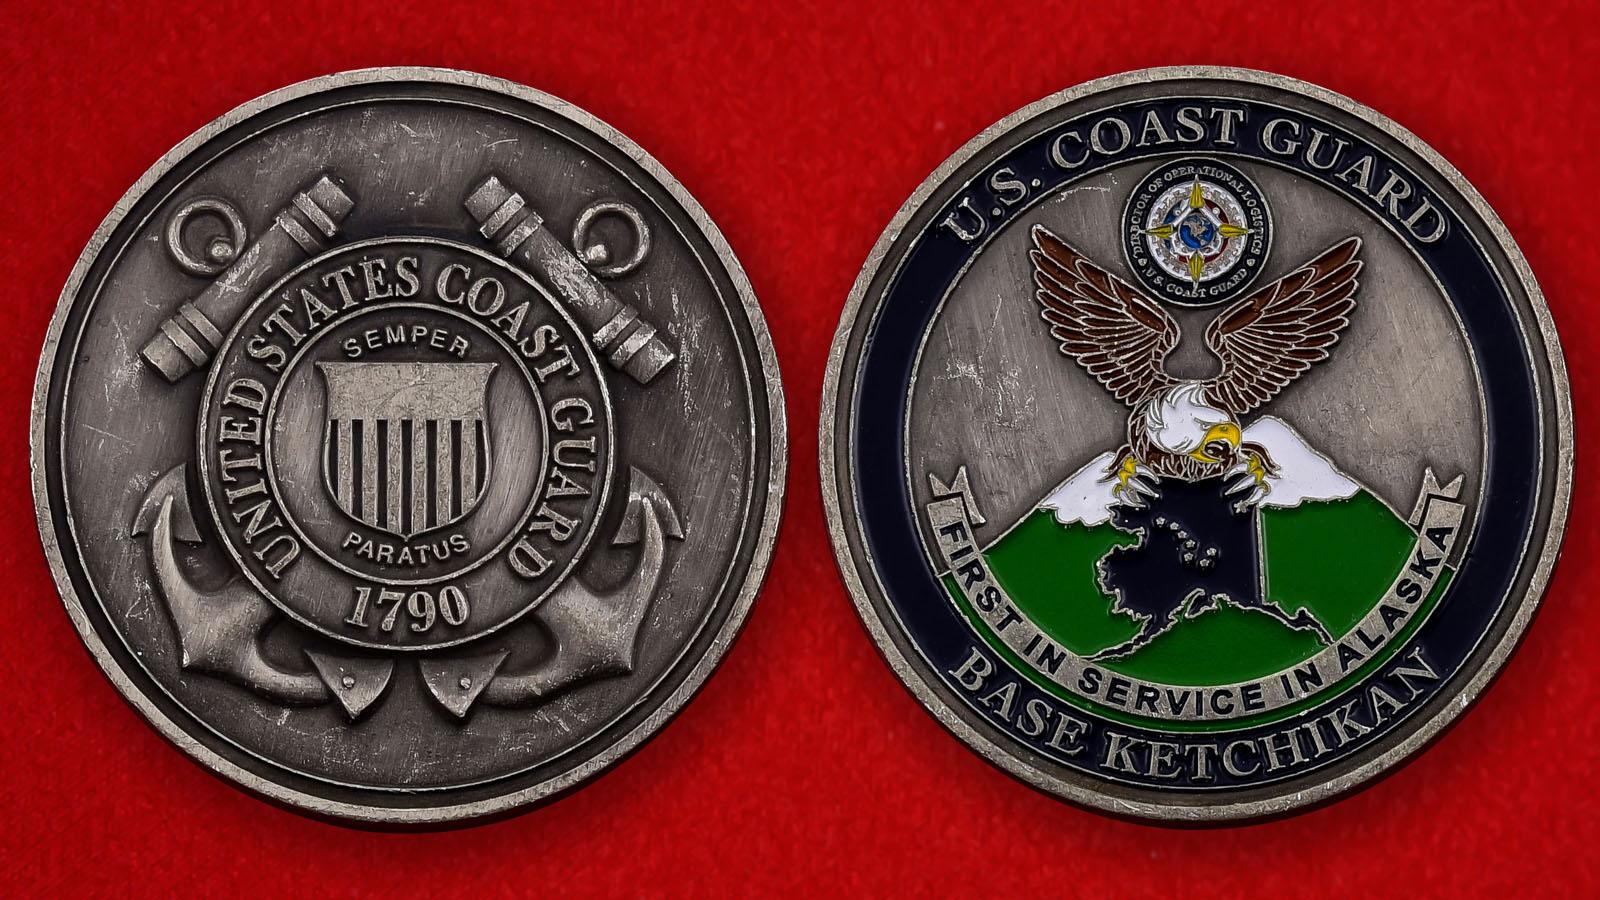 "Юбилейеая монета США ""База Береговой охраны Кетчикан, Аляска"""